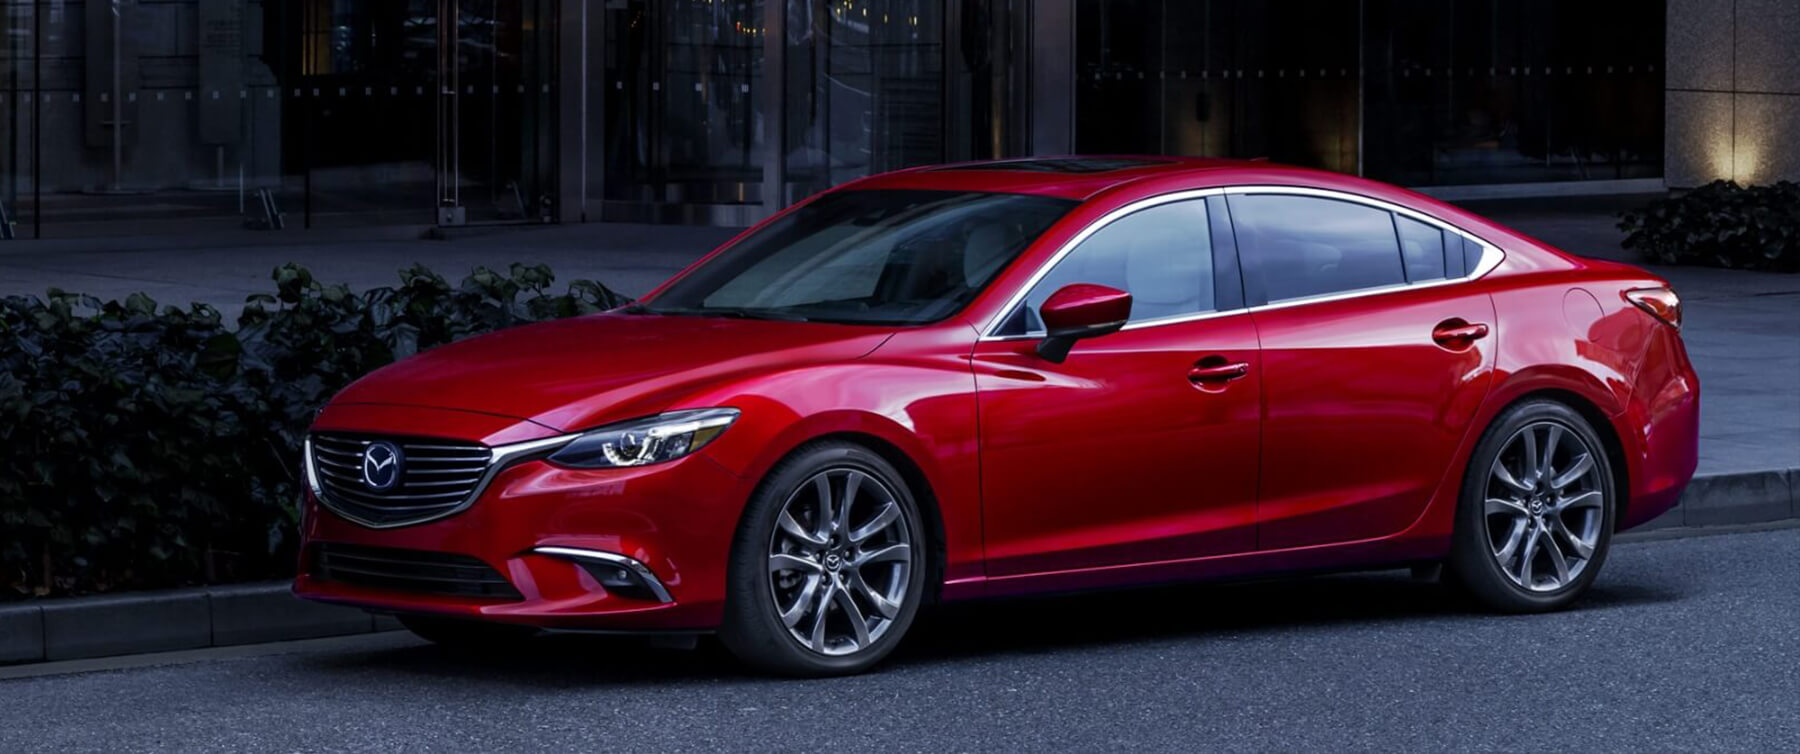 2017 Mazda6 Parked on City Street